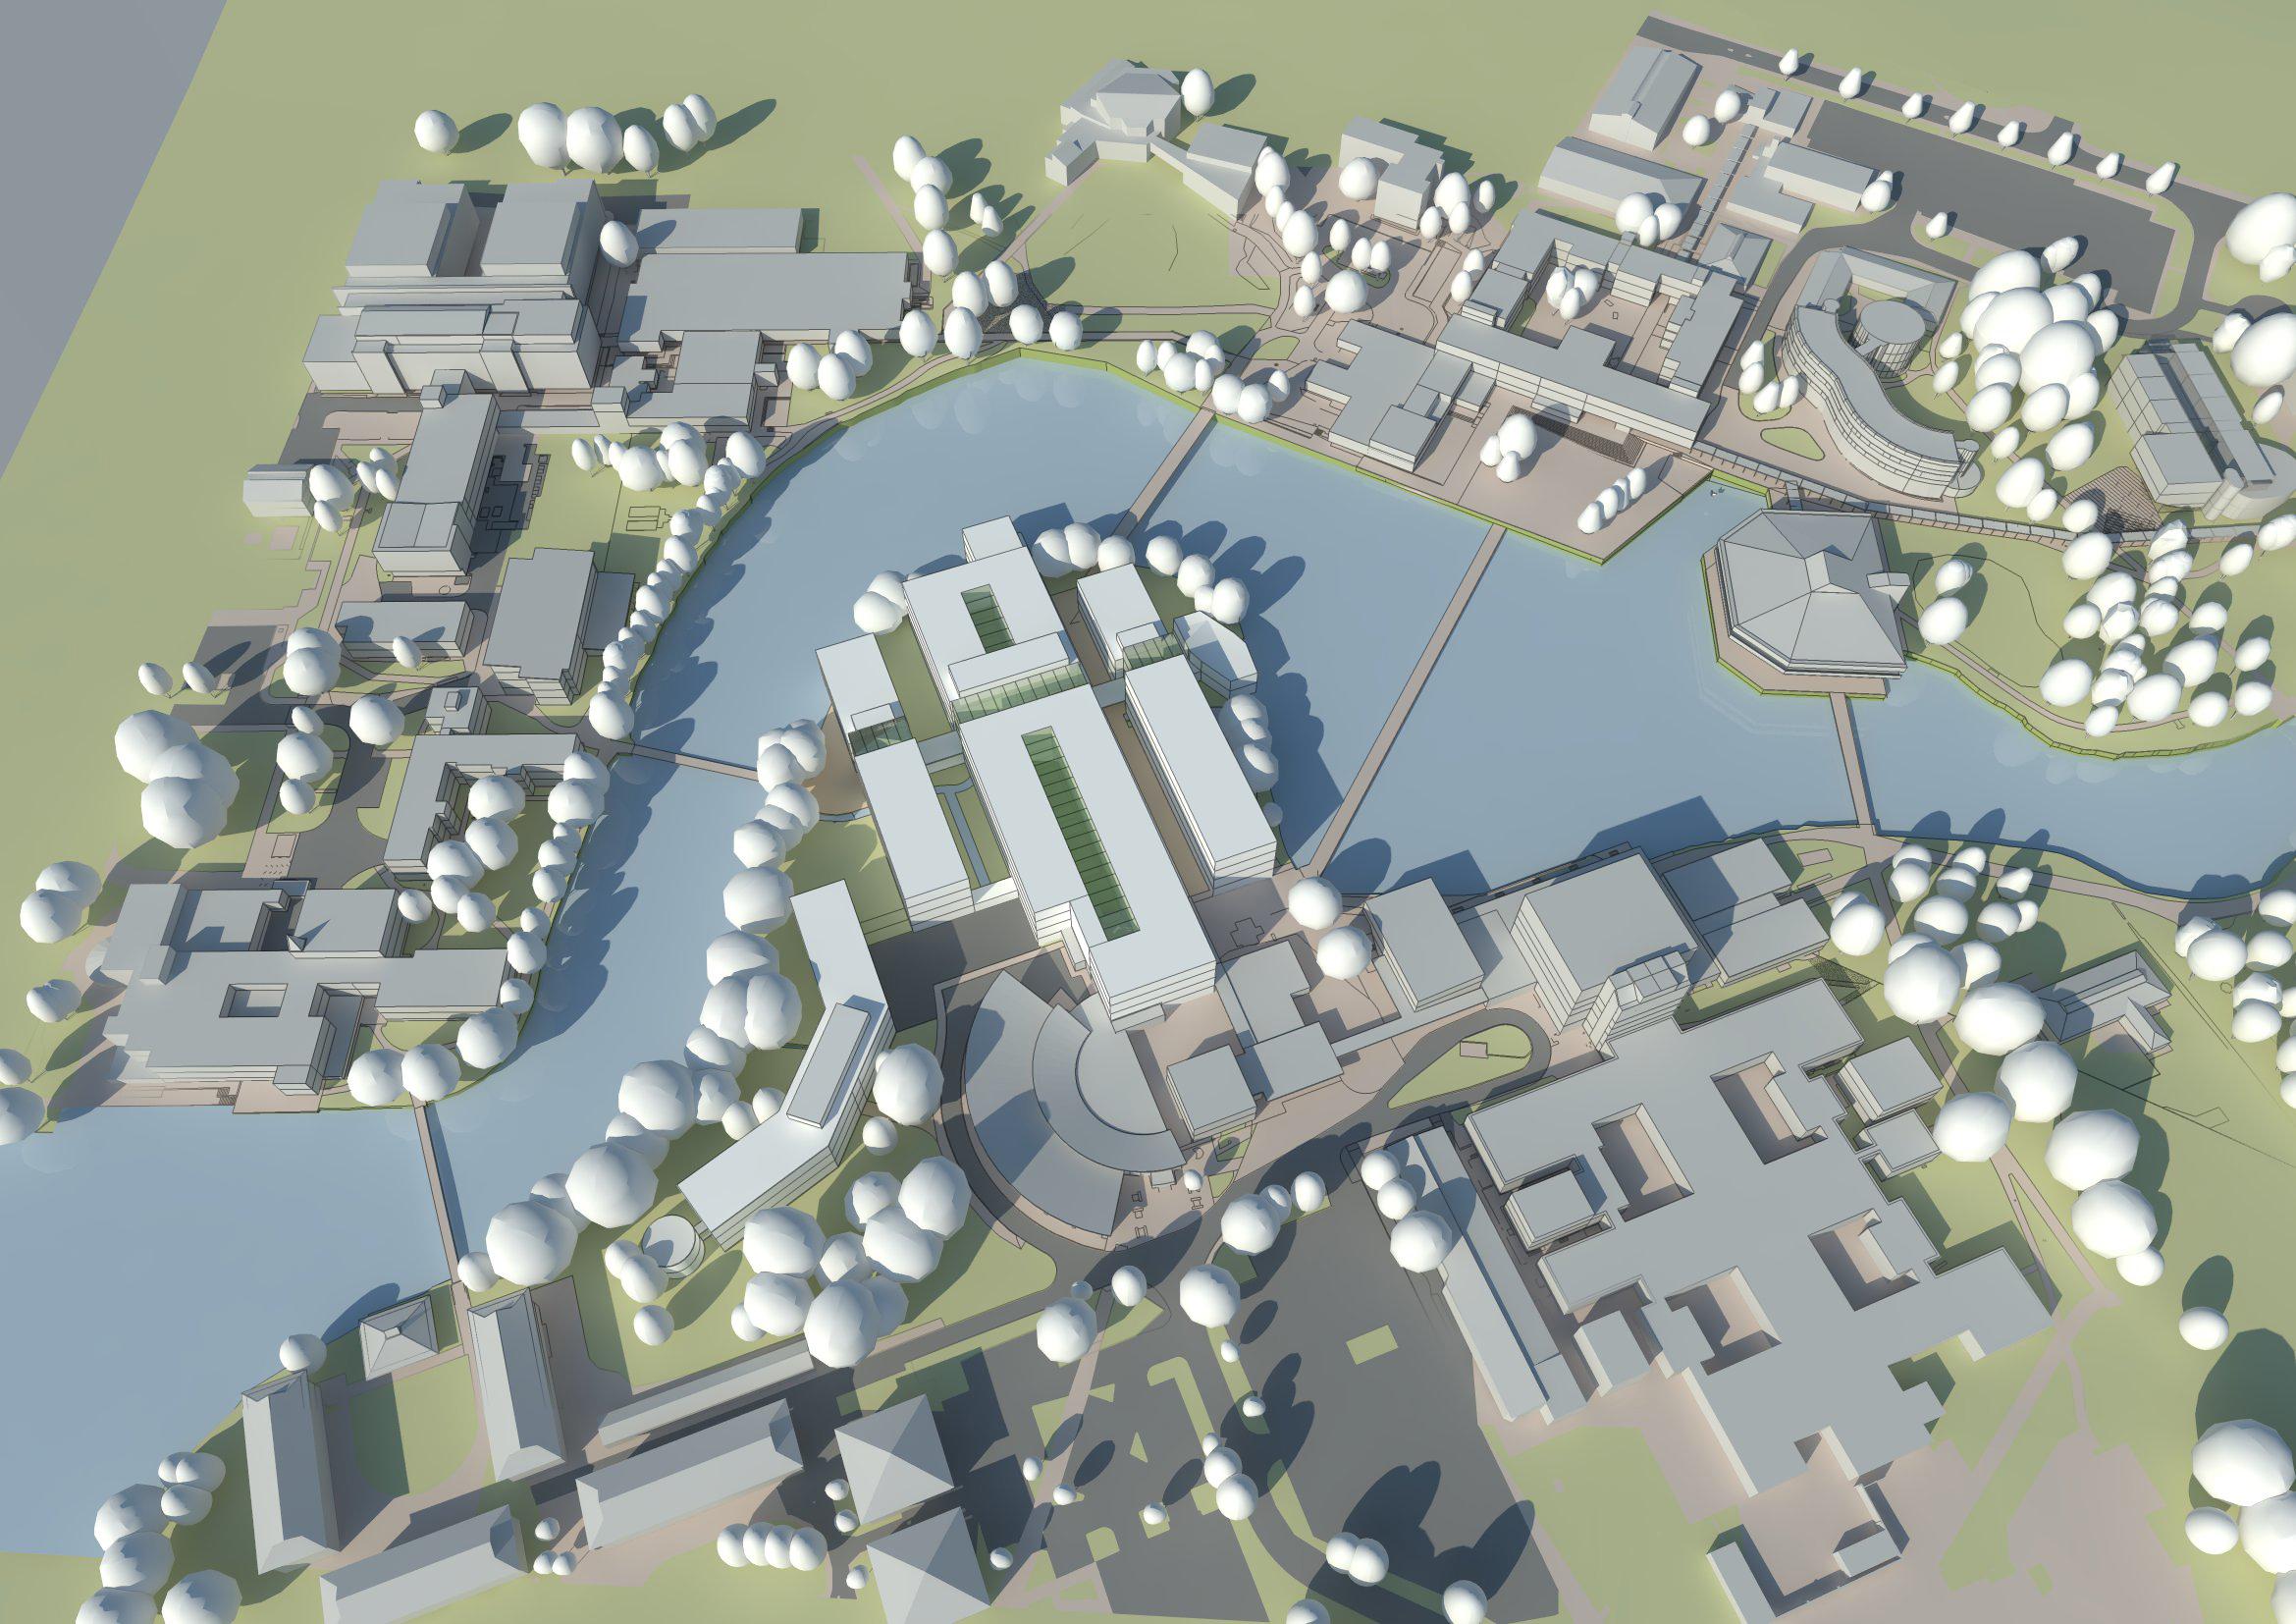 Stephen-Hill-Architects-York-University-Peninsula-Study-03